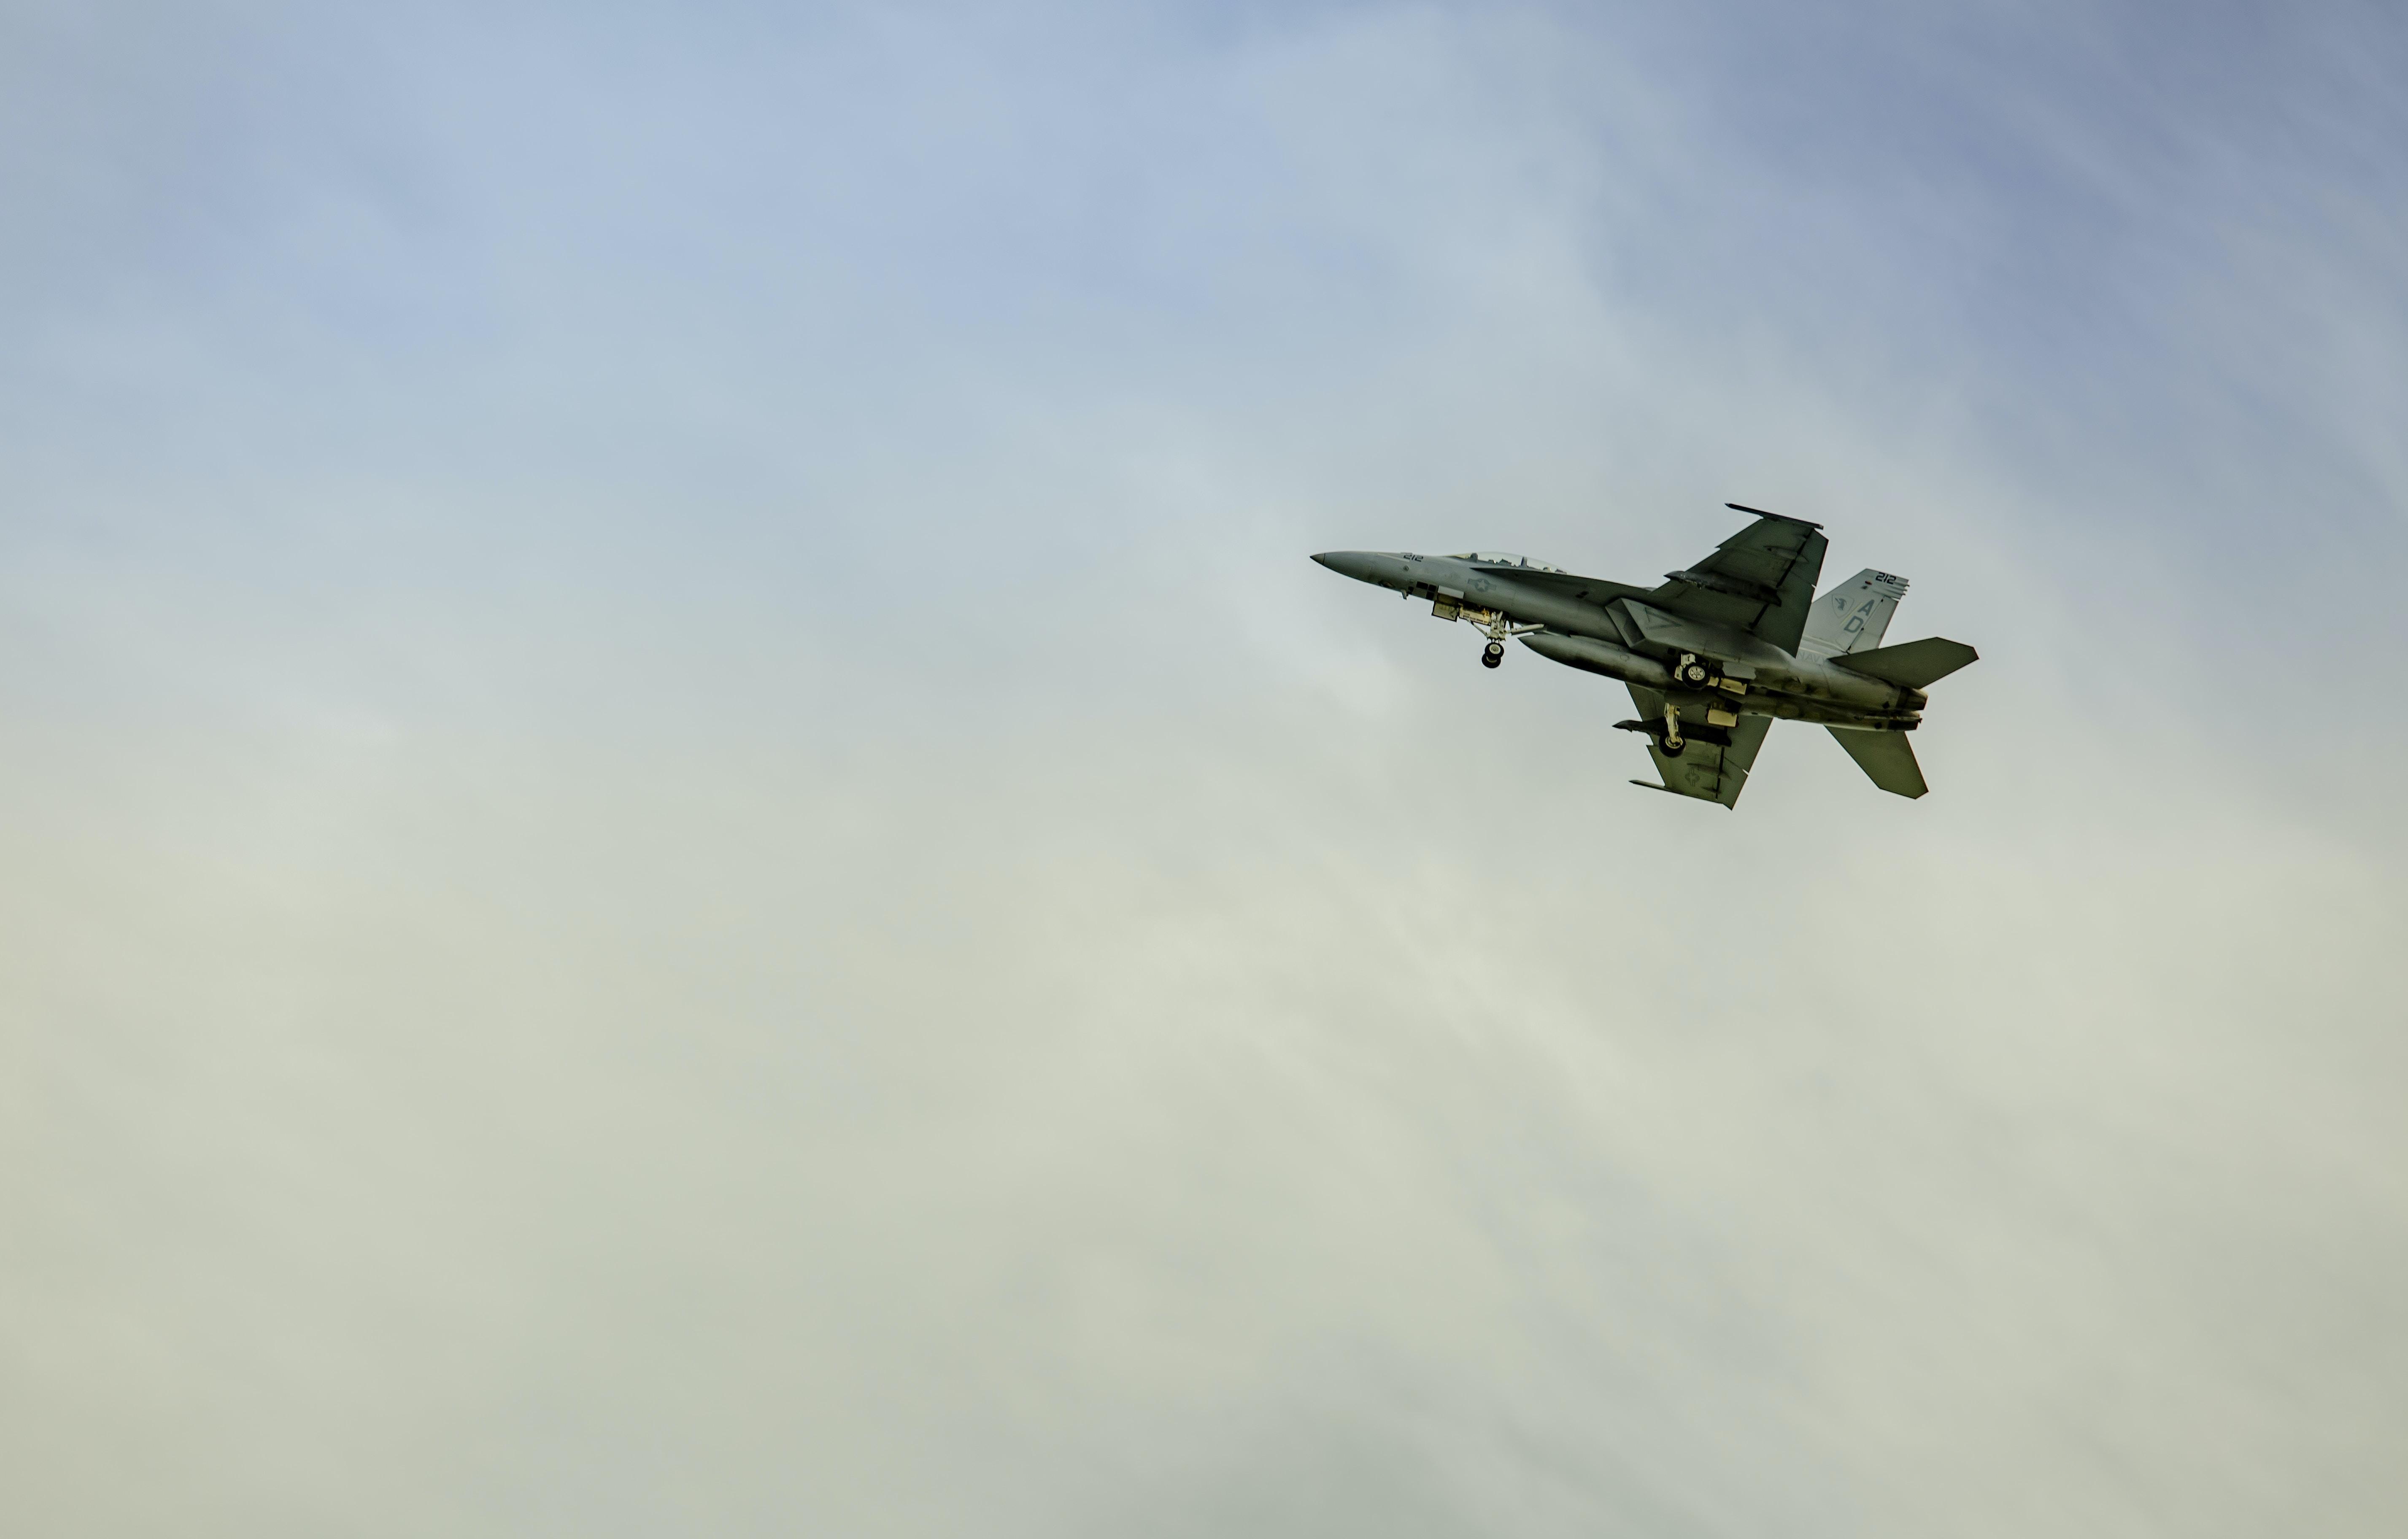 gray jet fighter flying through sky